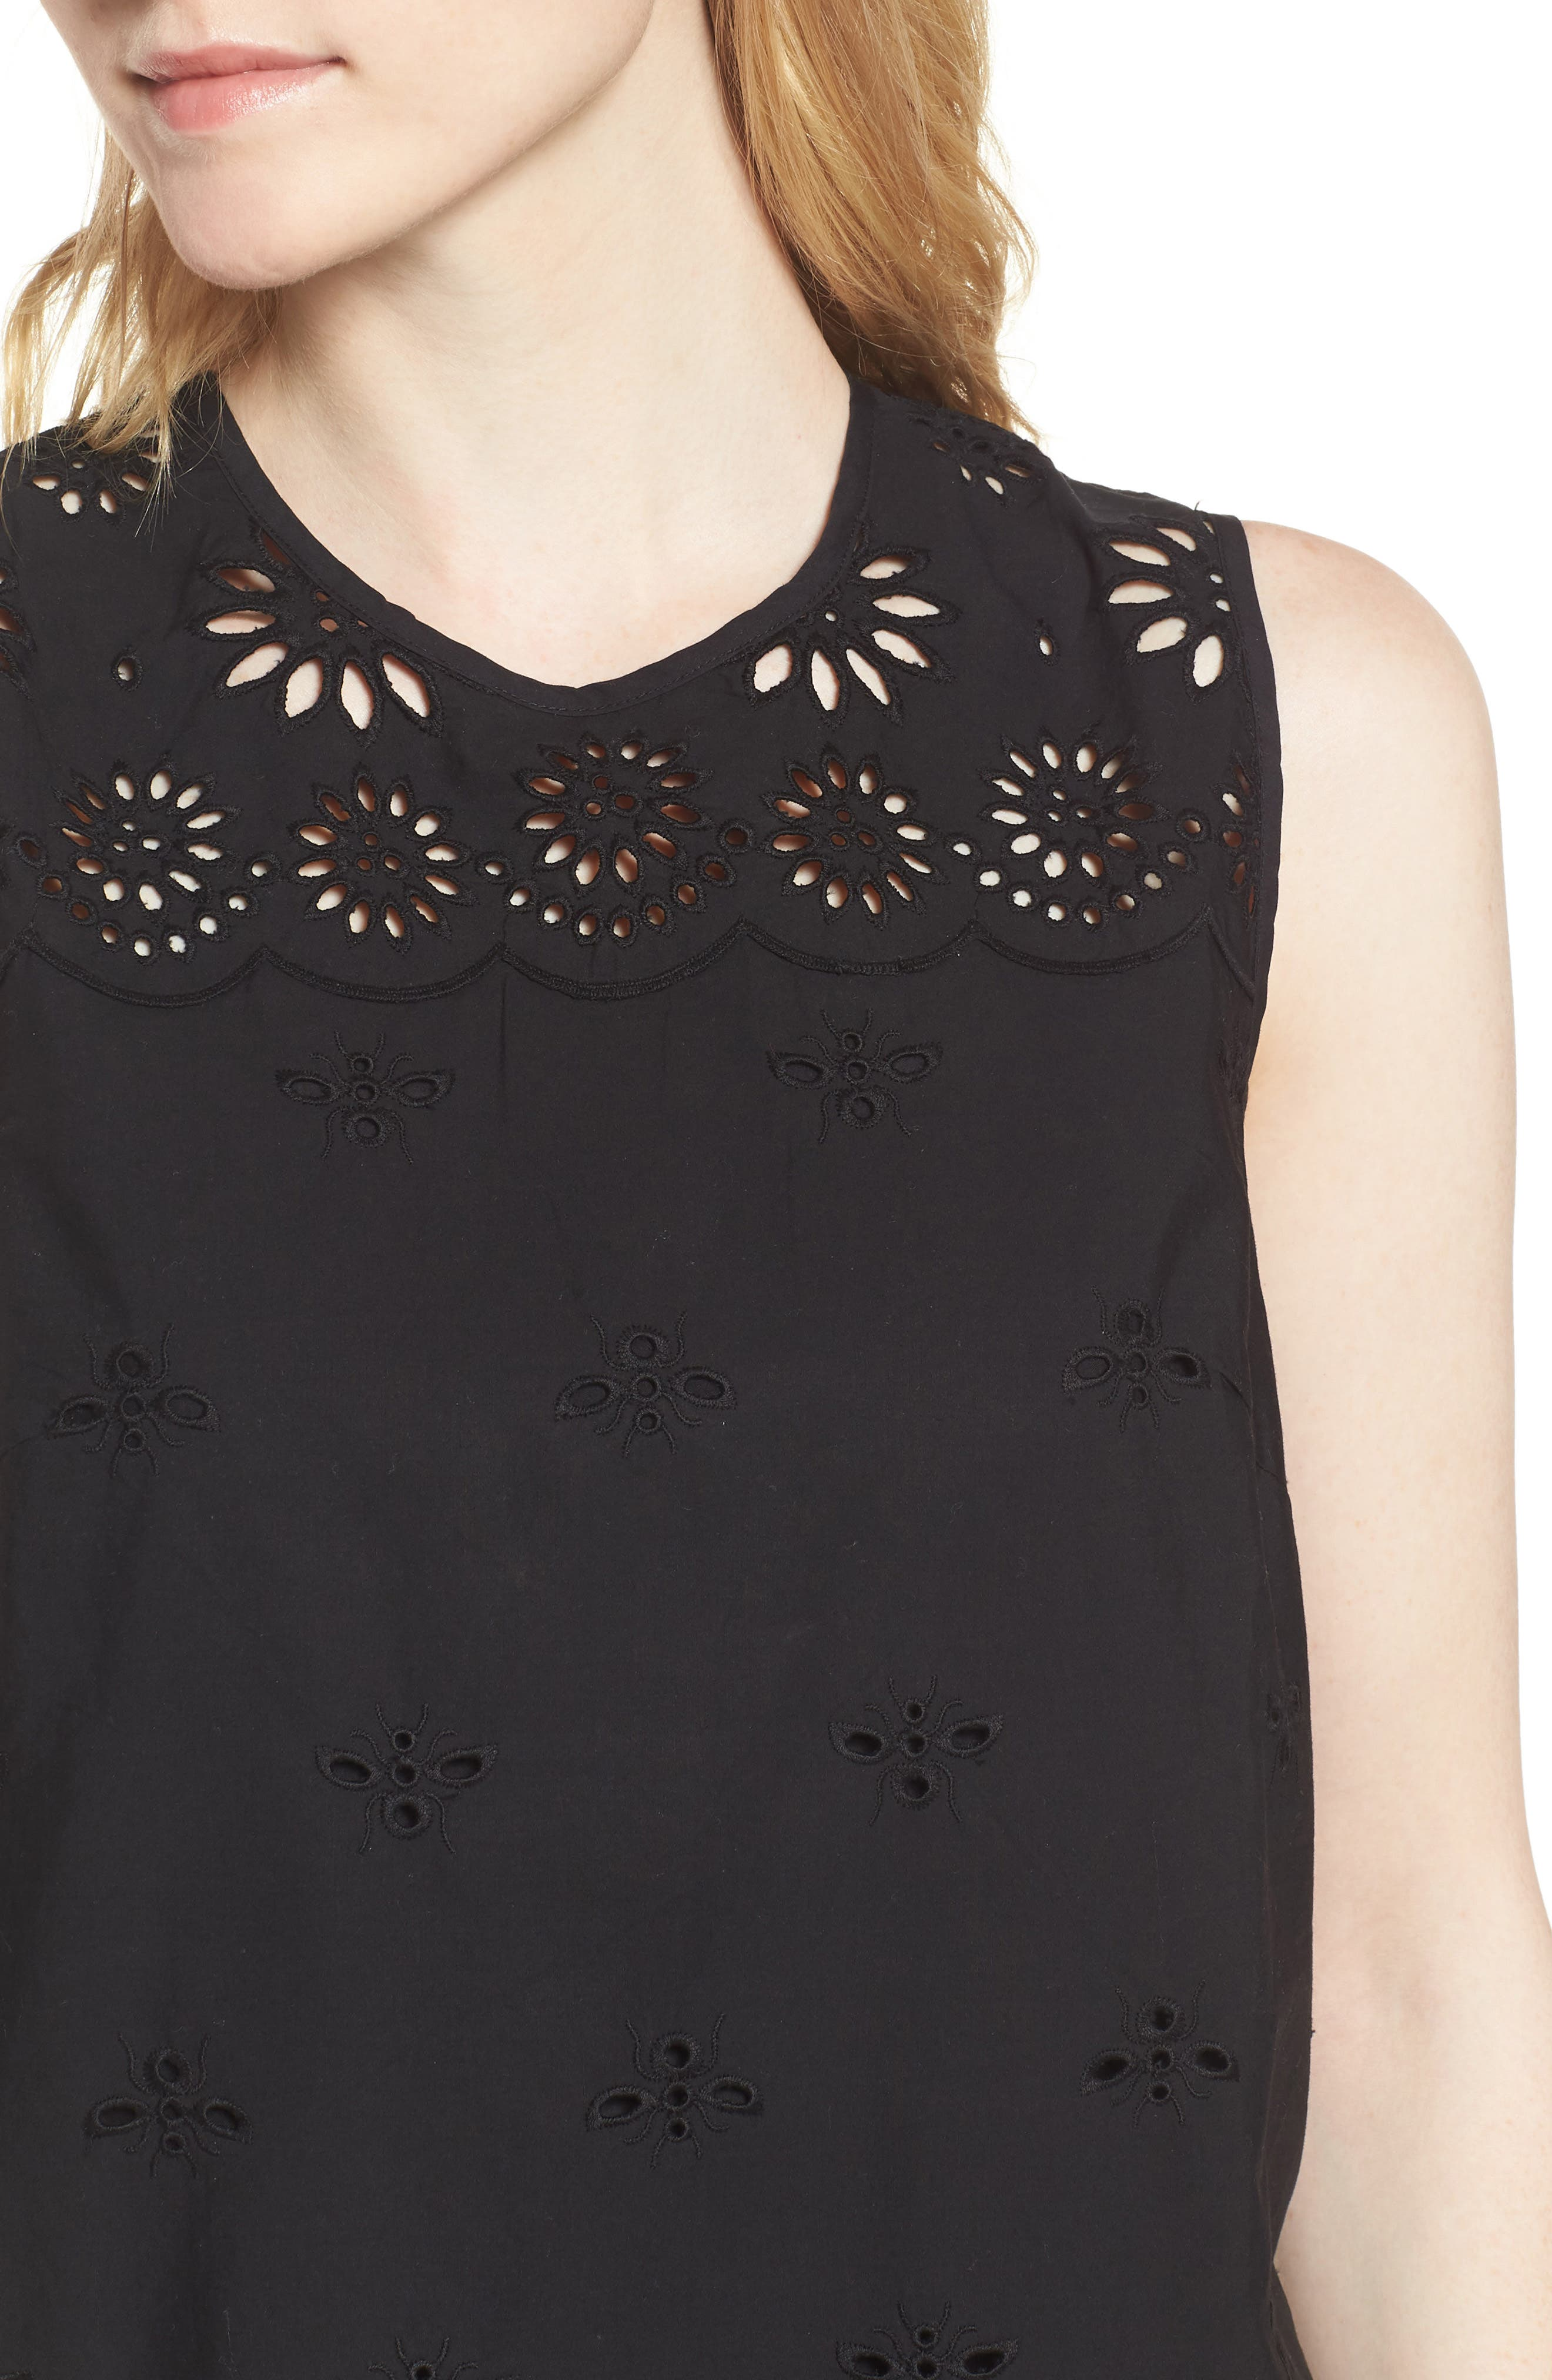 Dante Yellowjacket Embroidery Dress,                             Alternate thumbnail 4, color,